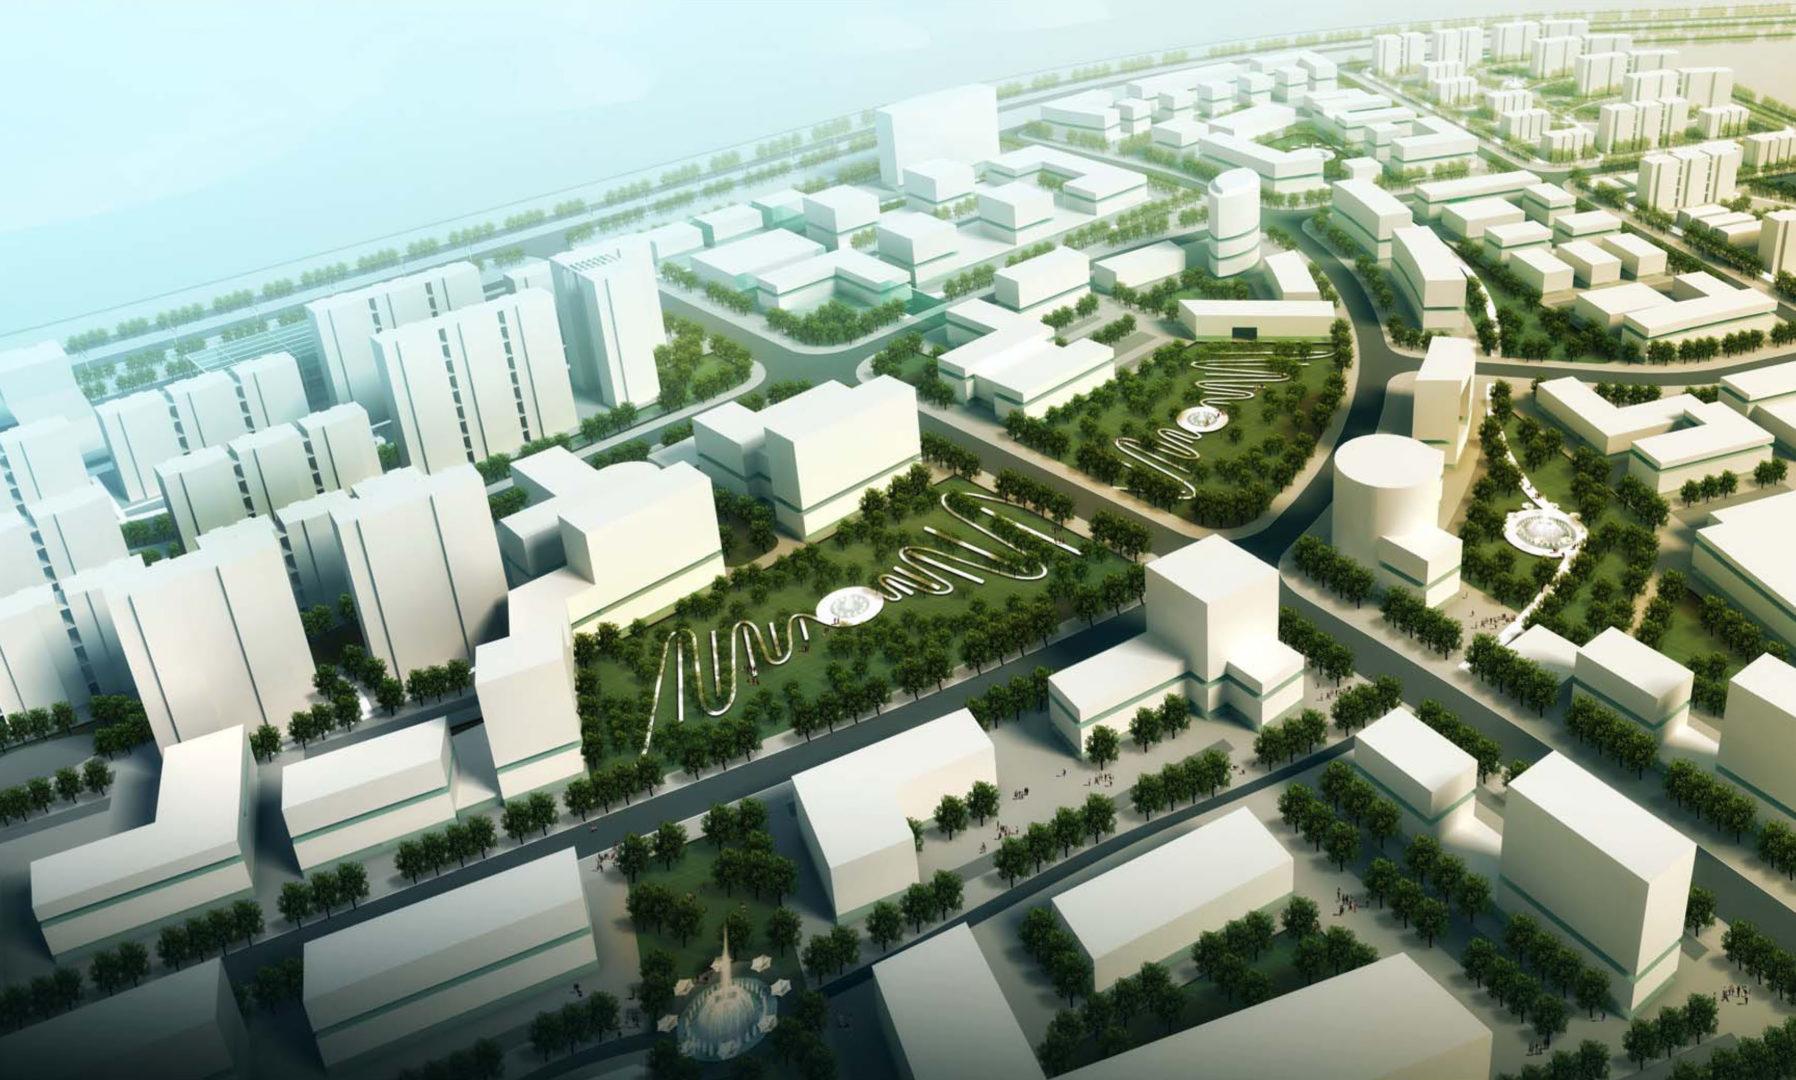 Dalian Industrial Park